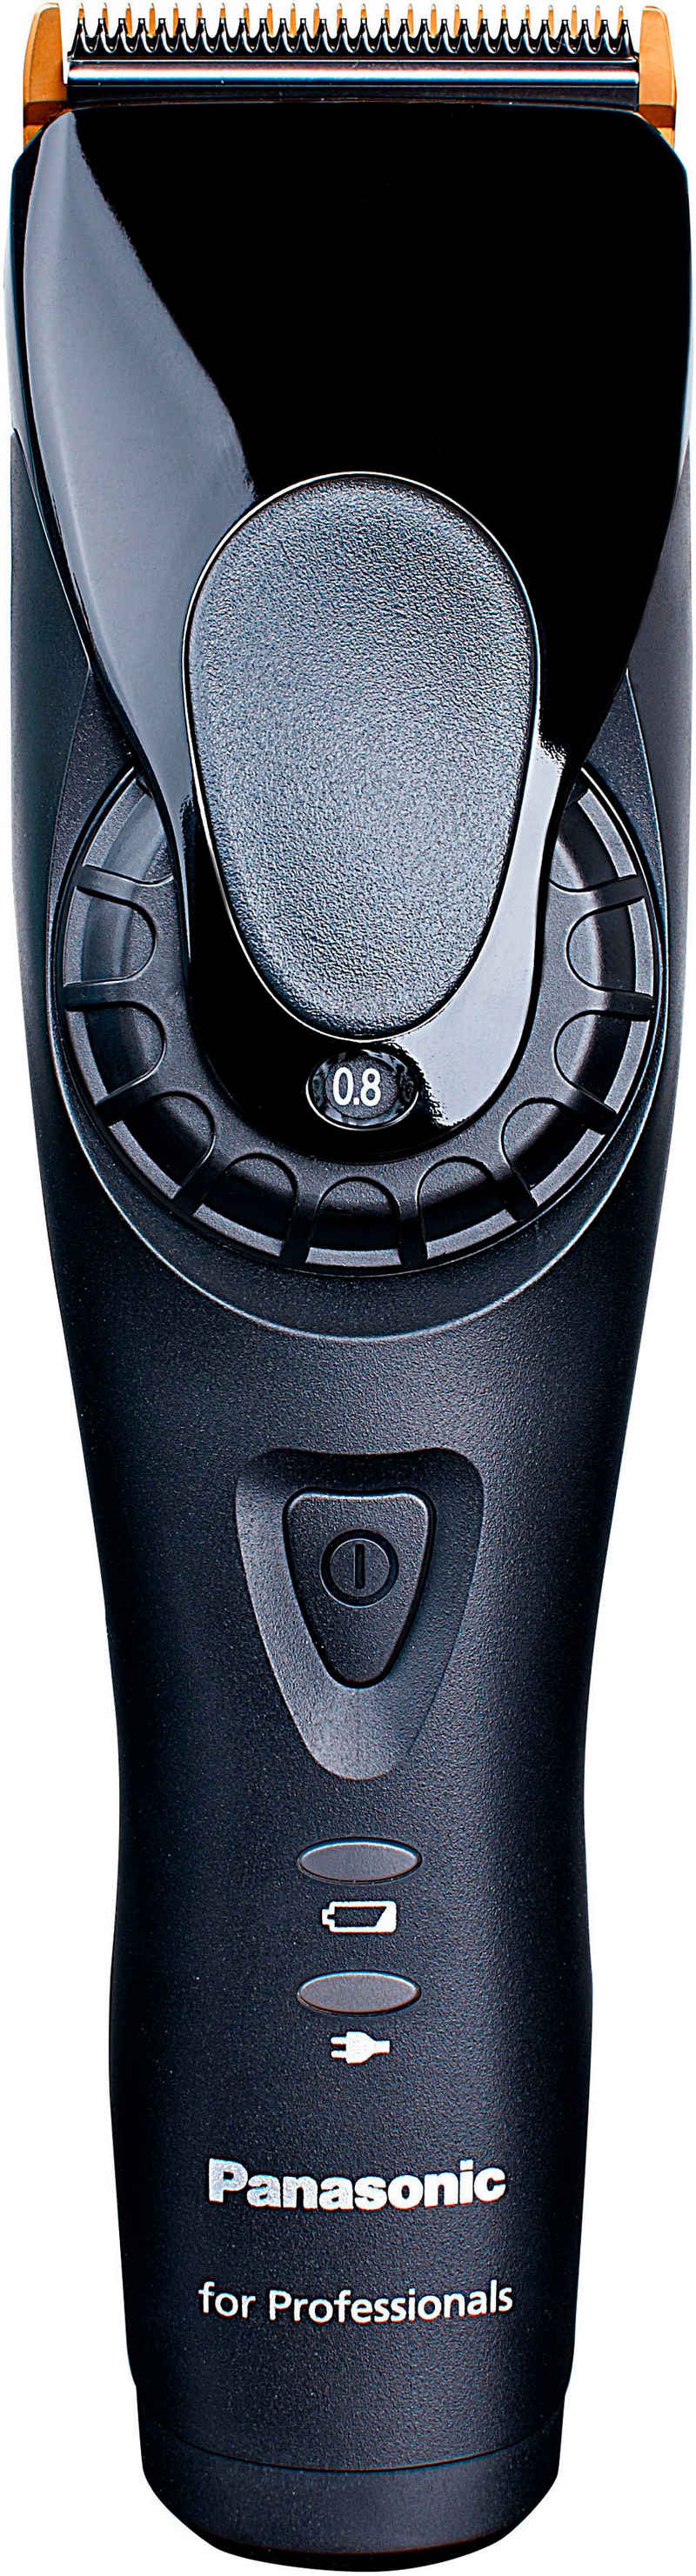 Panasonic Haarschneider ER-DGP82, Haarschneidemaschine